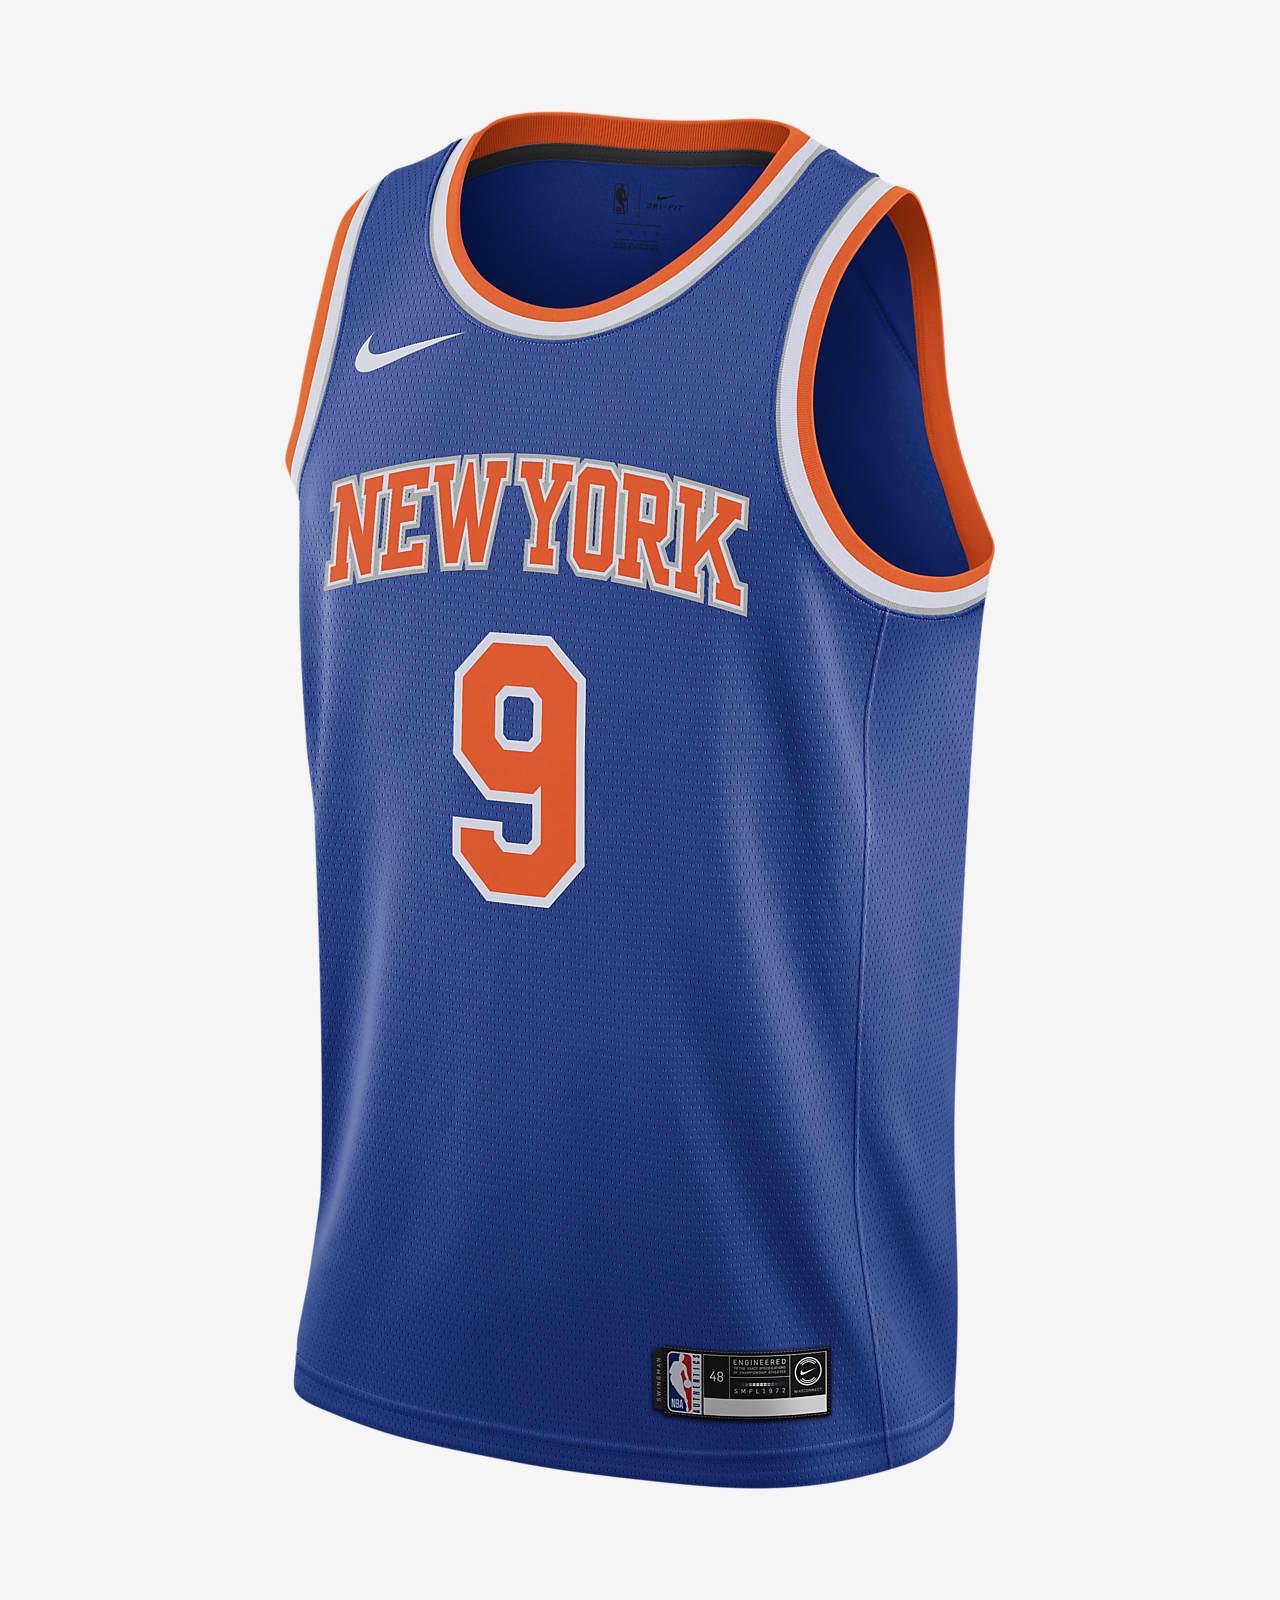 Camiseta Nike NBA Swingman para hombre RJ Barrett Knicks Icon Edition